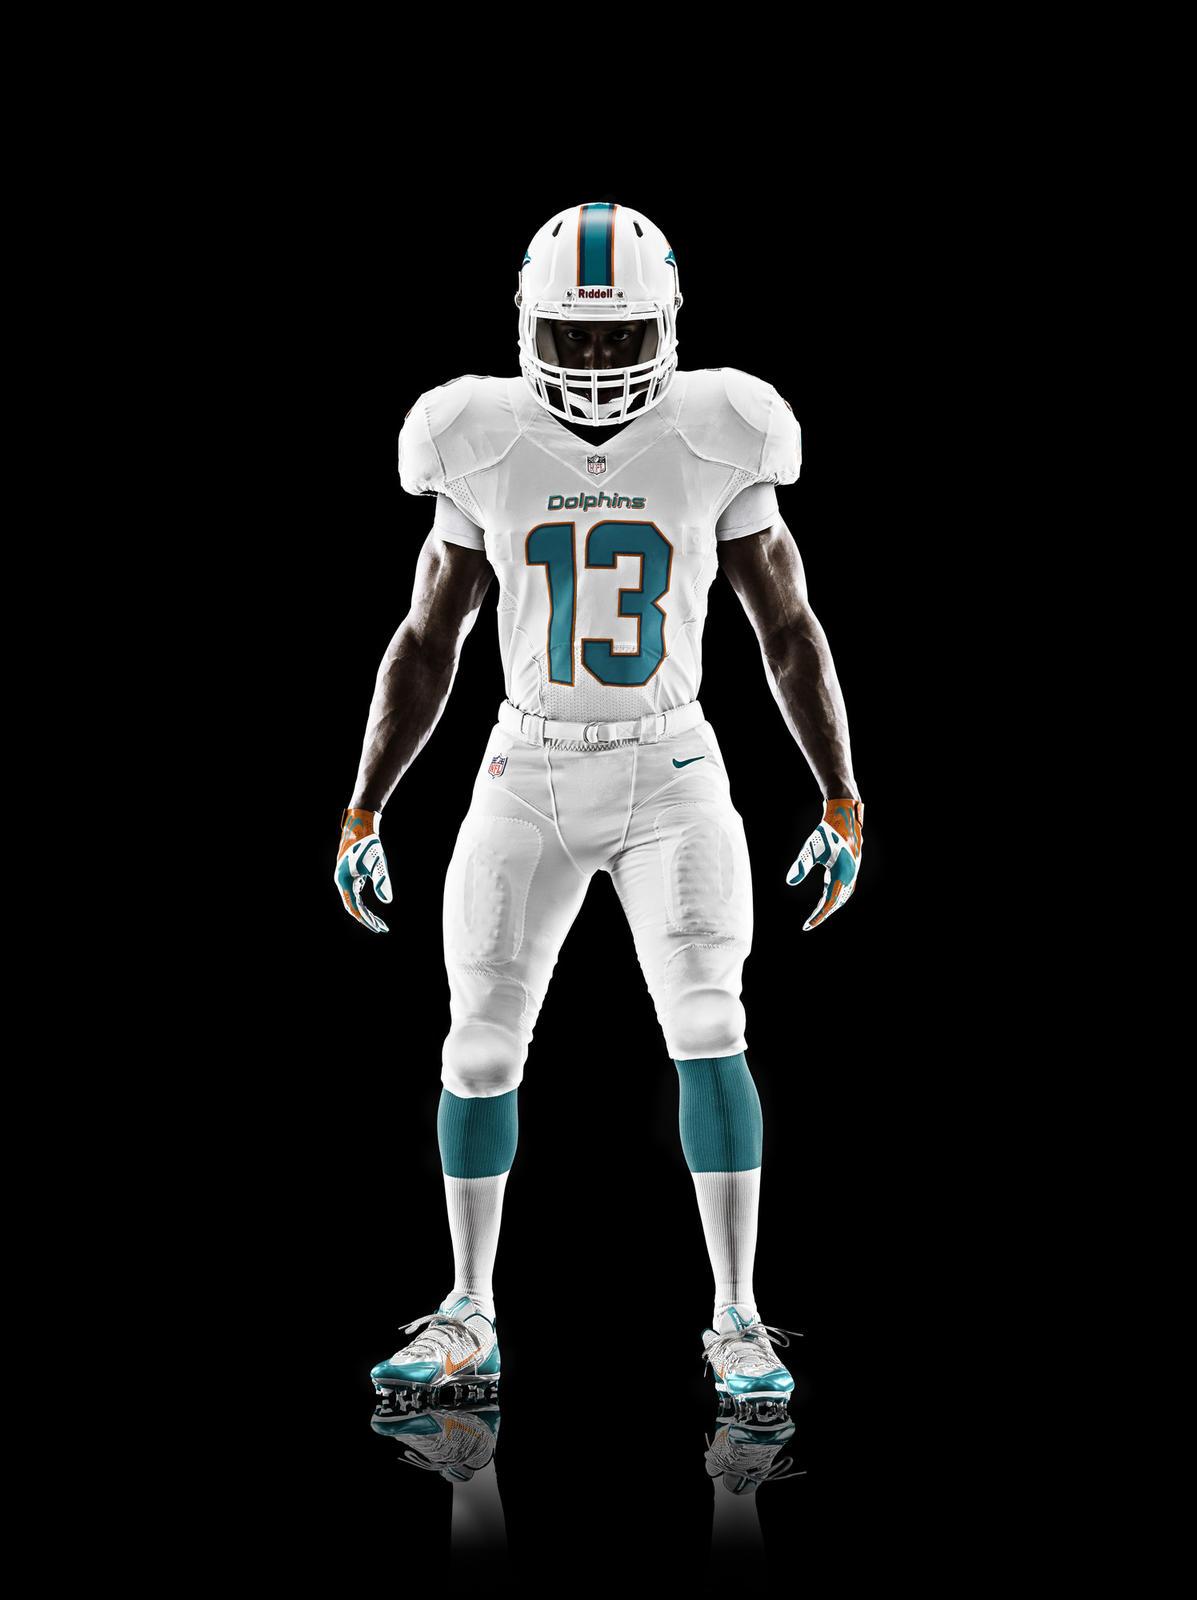 Miami Dolphins Unveil New Uniform Design For 2013 Season